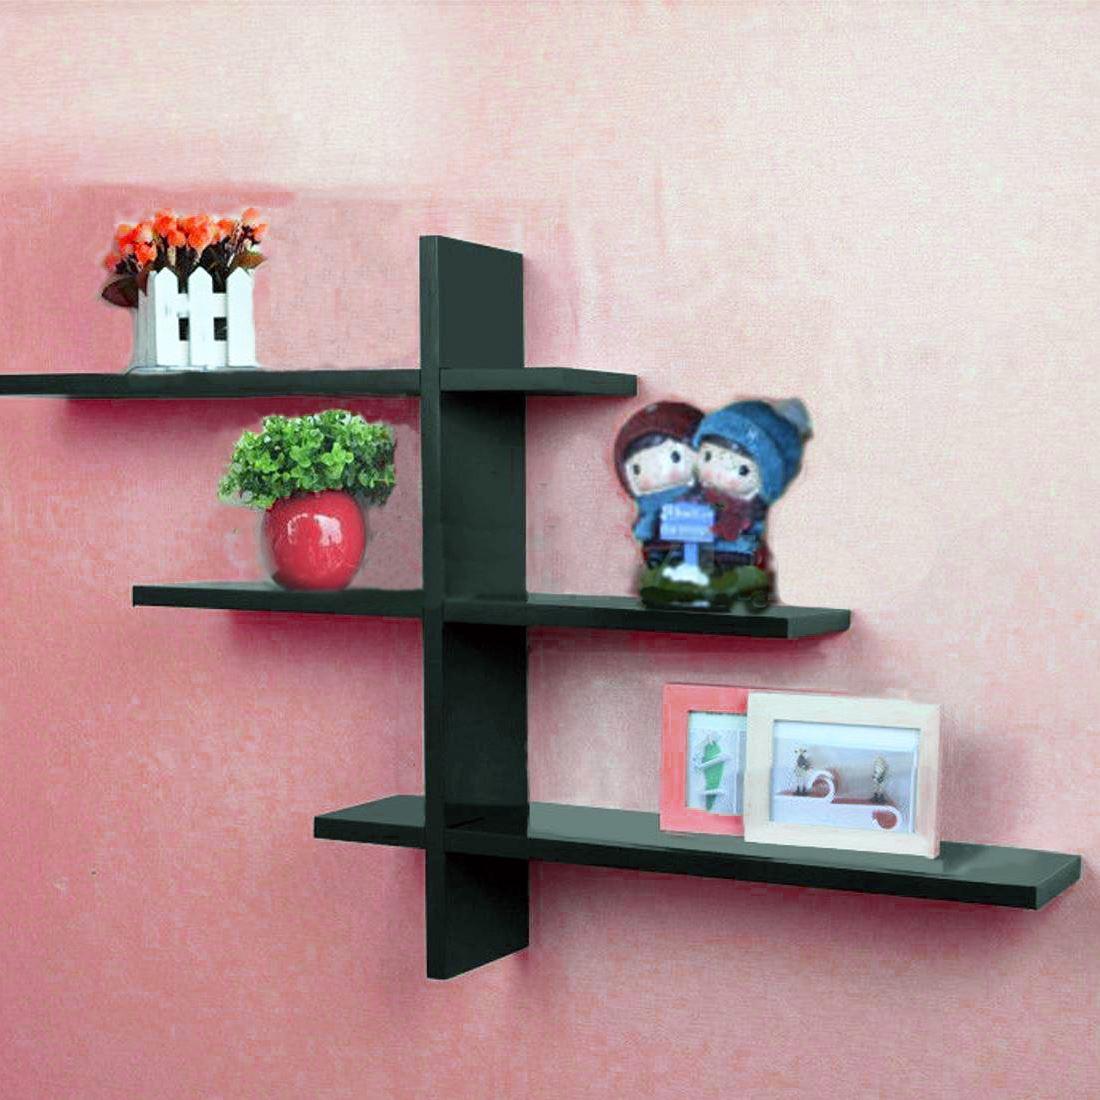 T Shape Floating Shelf Wall Mounted Display Shelves